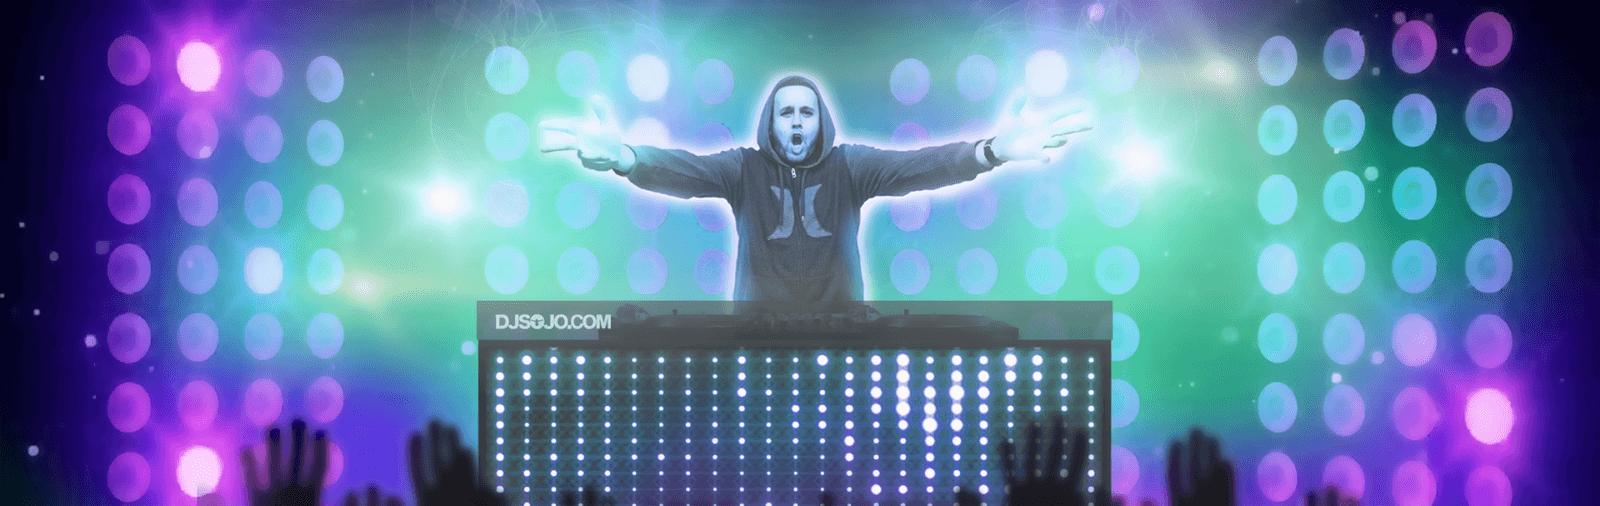 BEST-PARTY-DJ-NJ- BEST DJ IN NJ- NJ TOP DJ-PHILADELPHIA'S TOP DJ- BEST IN PHILLY-BEST IN AC